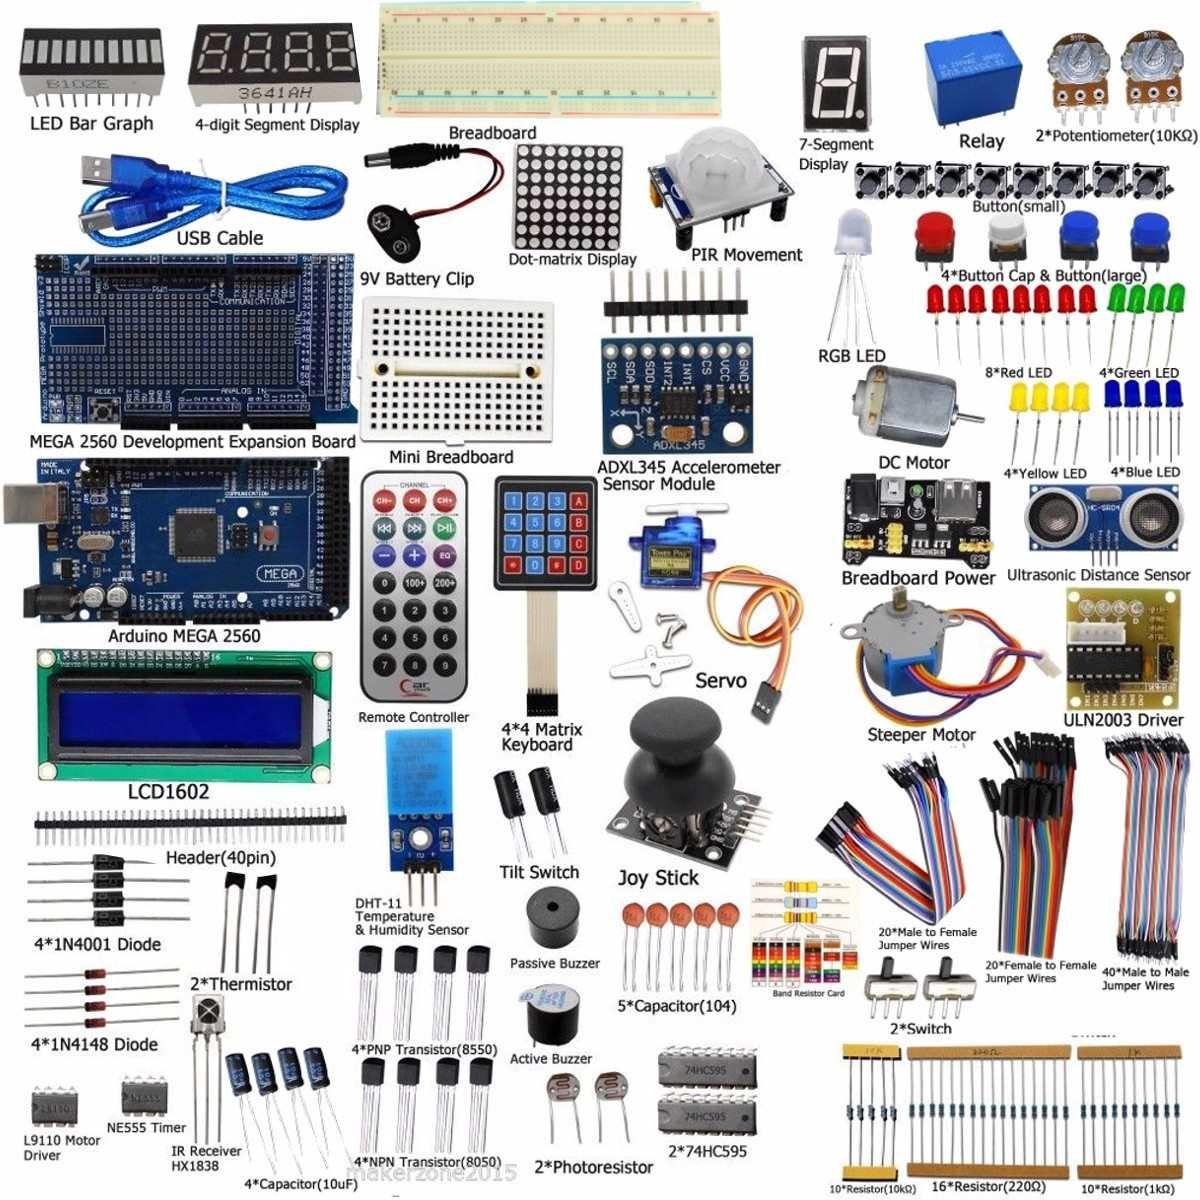 Nueva DIY Eléctrica Unidad Final Servo Motor Starter Kit para Arduino MEGA 2560 1602 LCD LED Relé RTC kit Electrónico